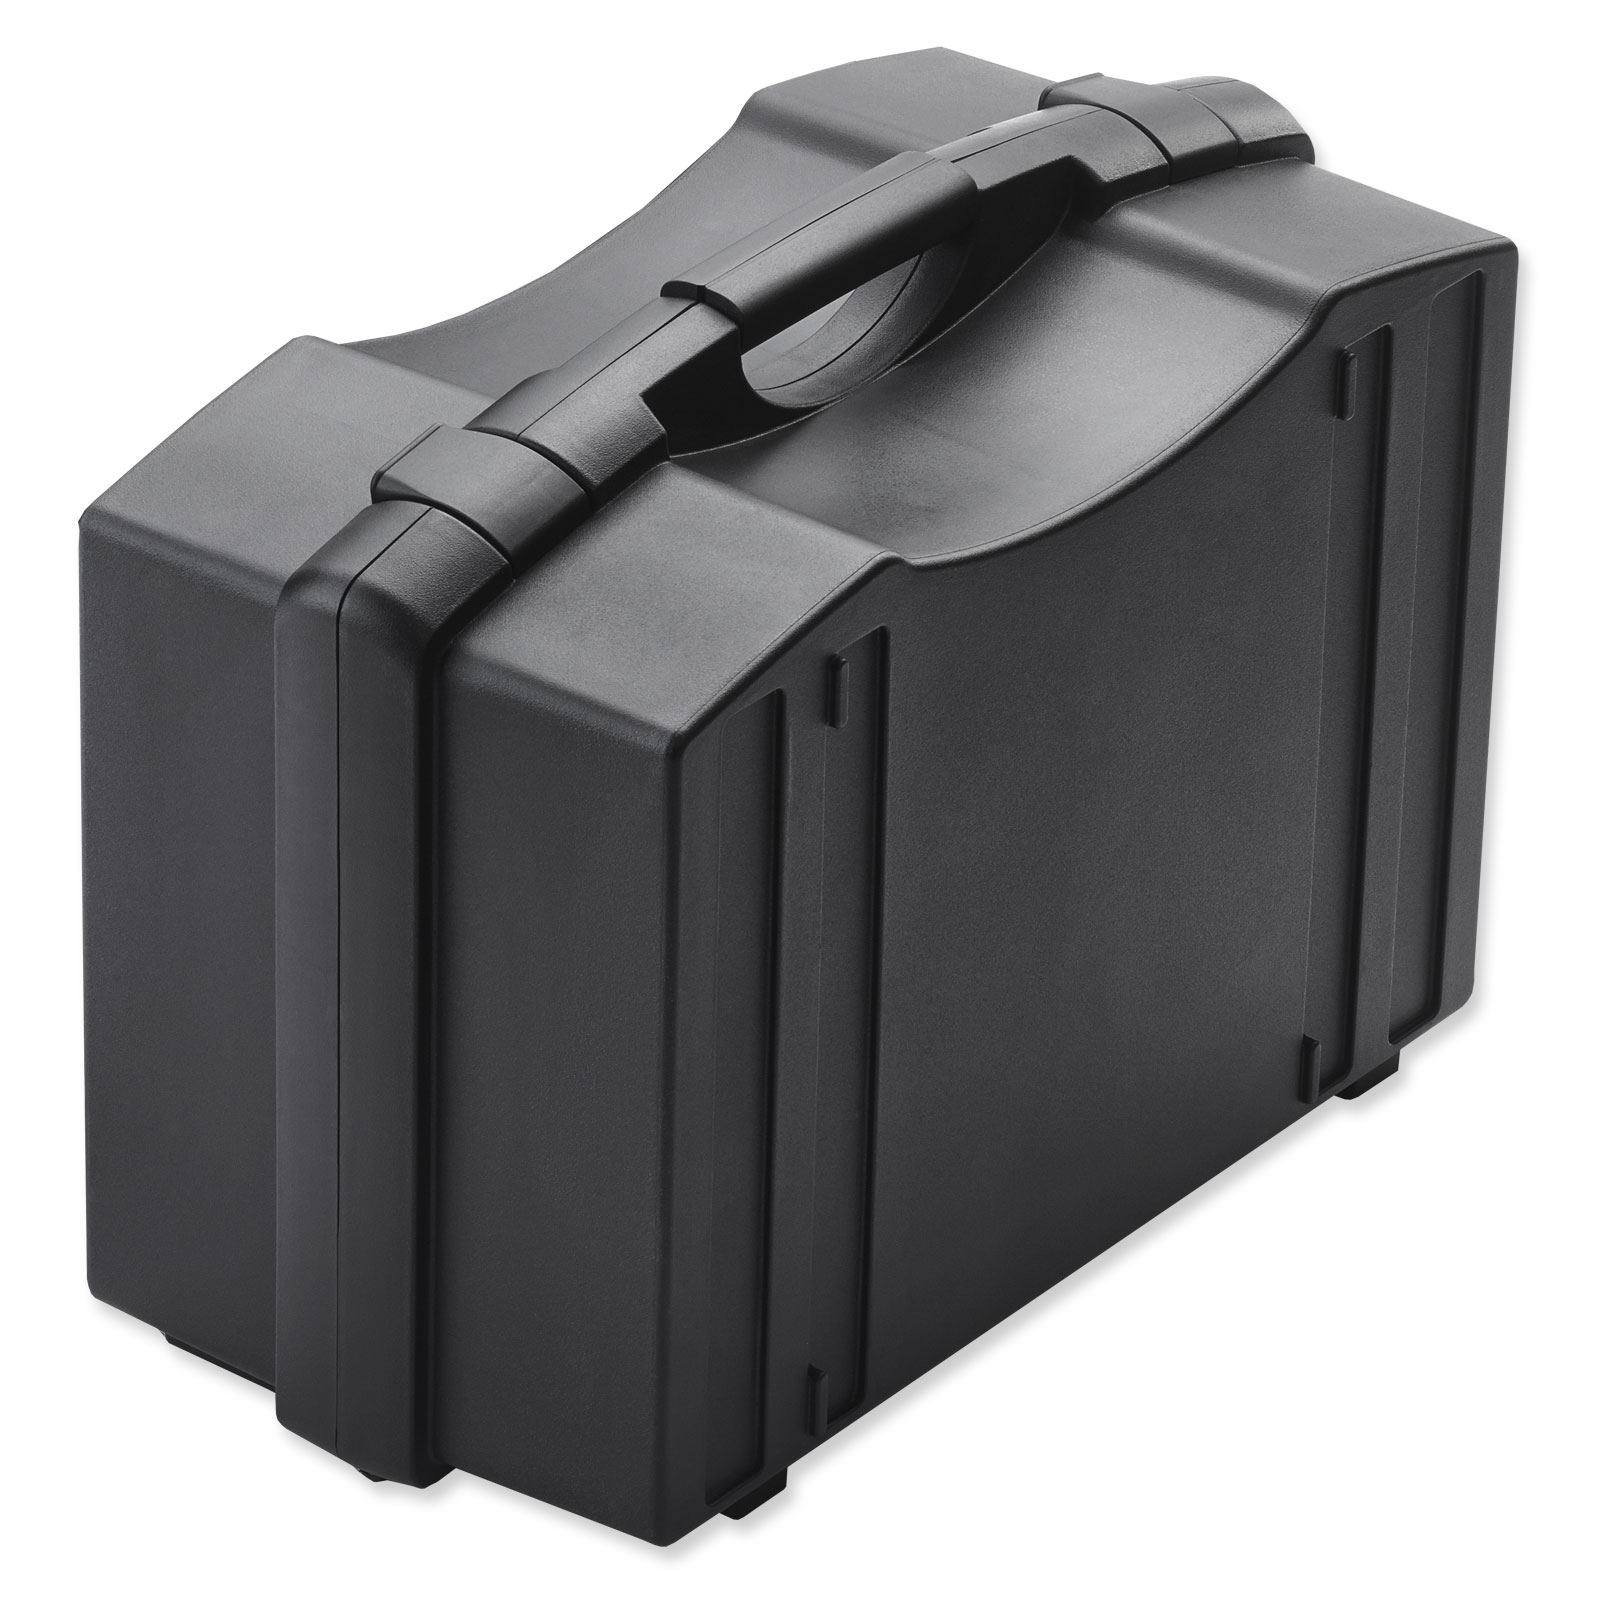 bwh Koffer  Protector Case Werkzeugkoffer groß